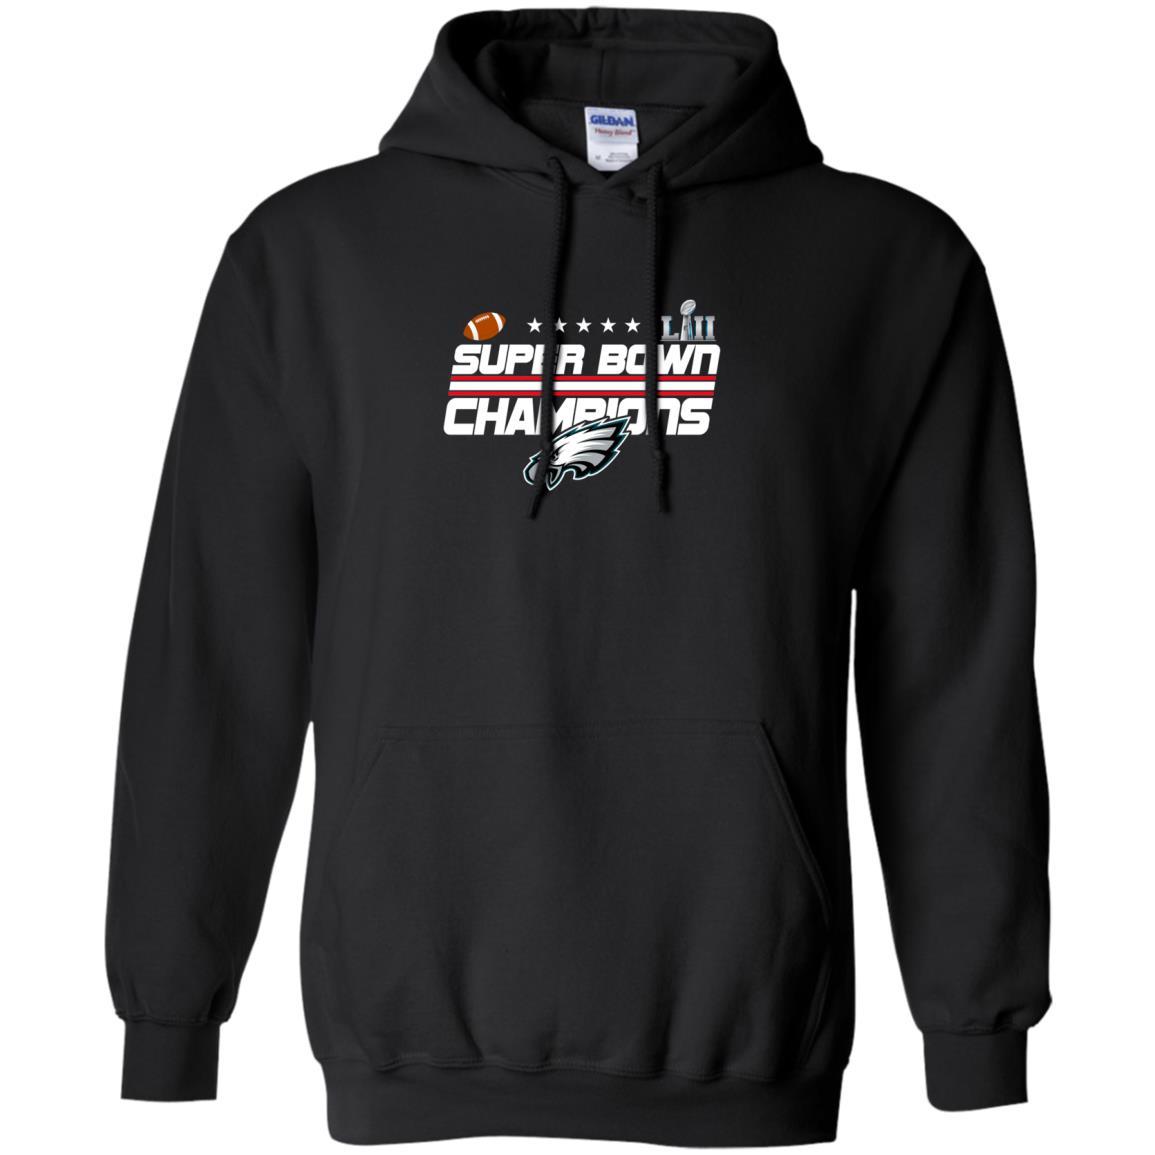 image 247 - Eagles Super Bowl Champions Shirt, Hoodie, Sweatshirt